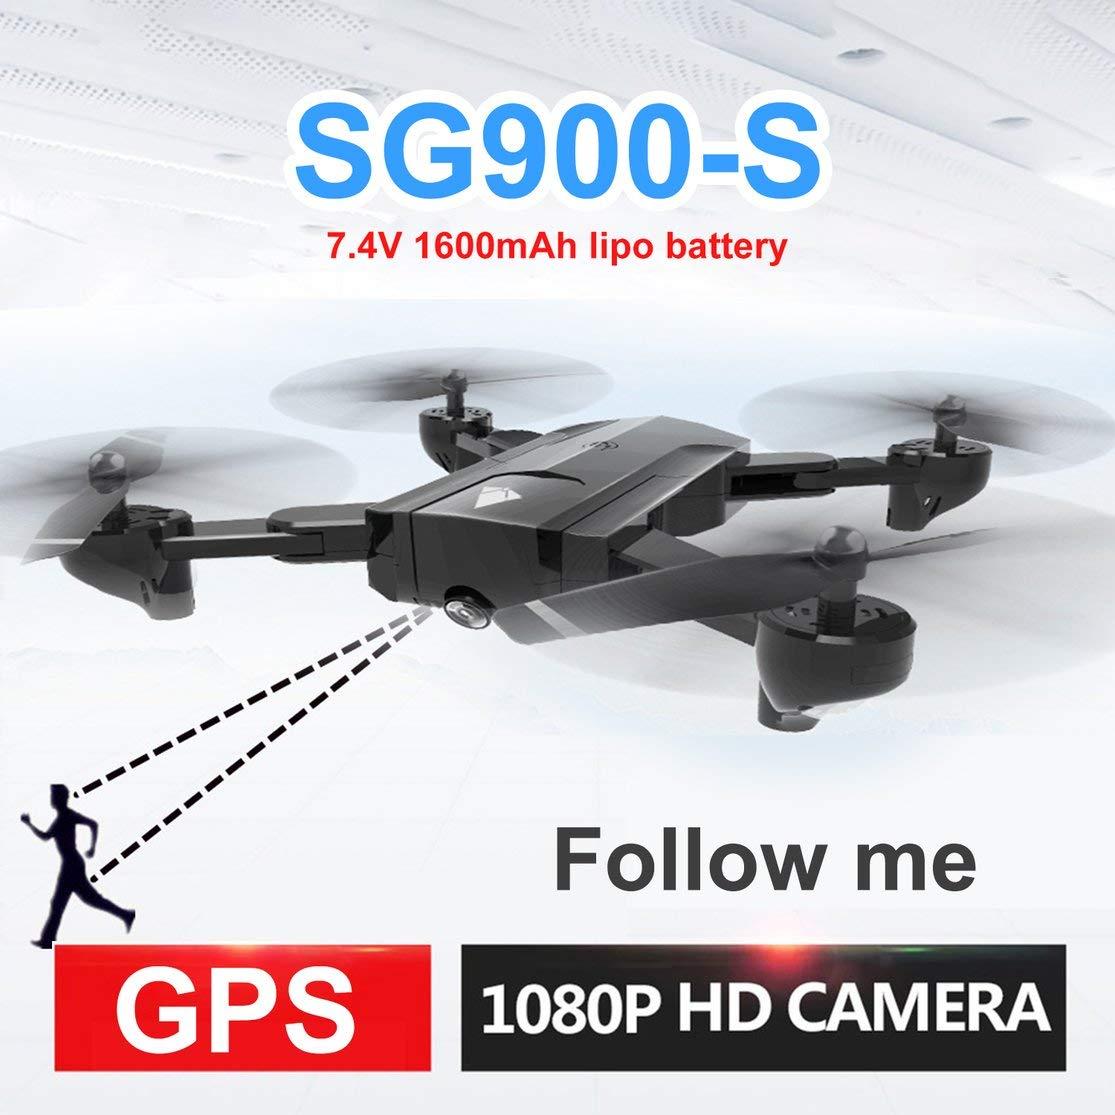 LouiseEvel215 3 Batería SG900-S 2.4G RC Drone Selfie Plegable GPS ...